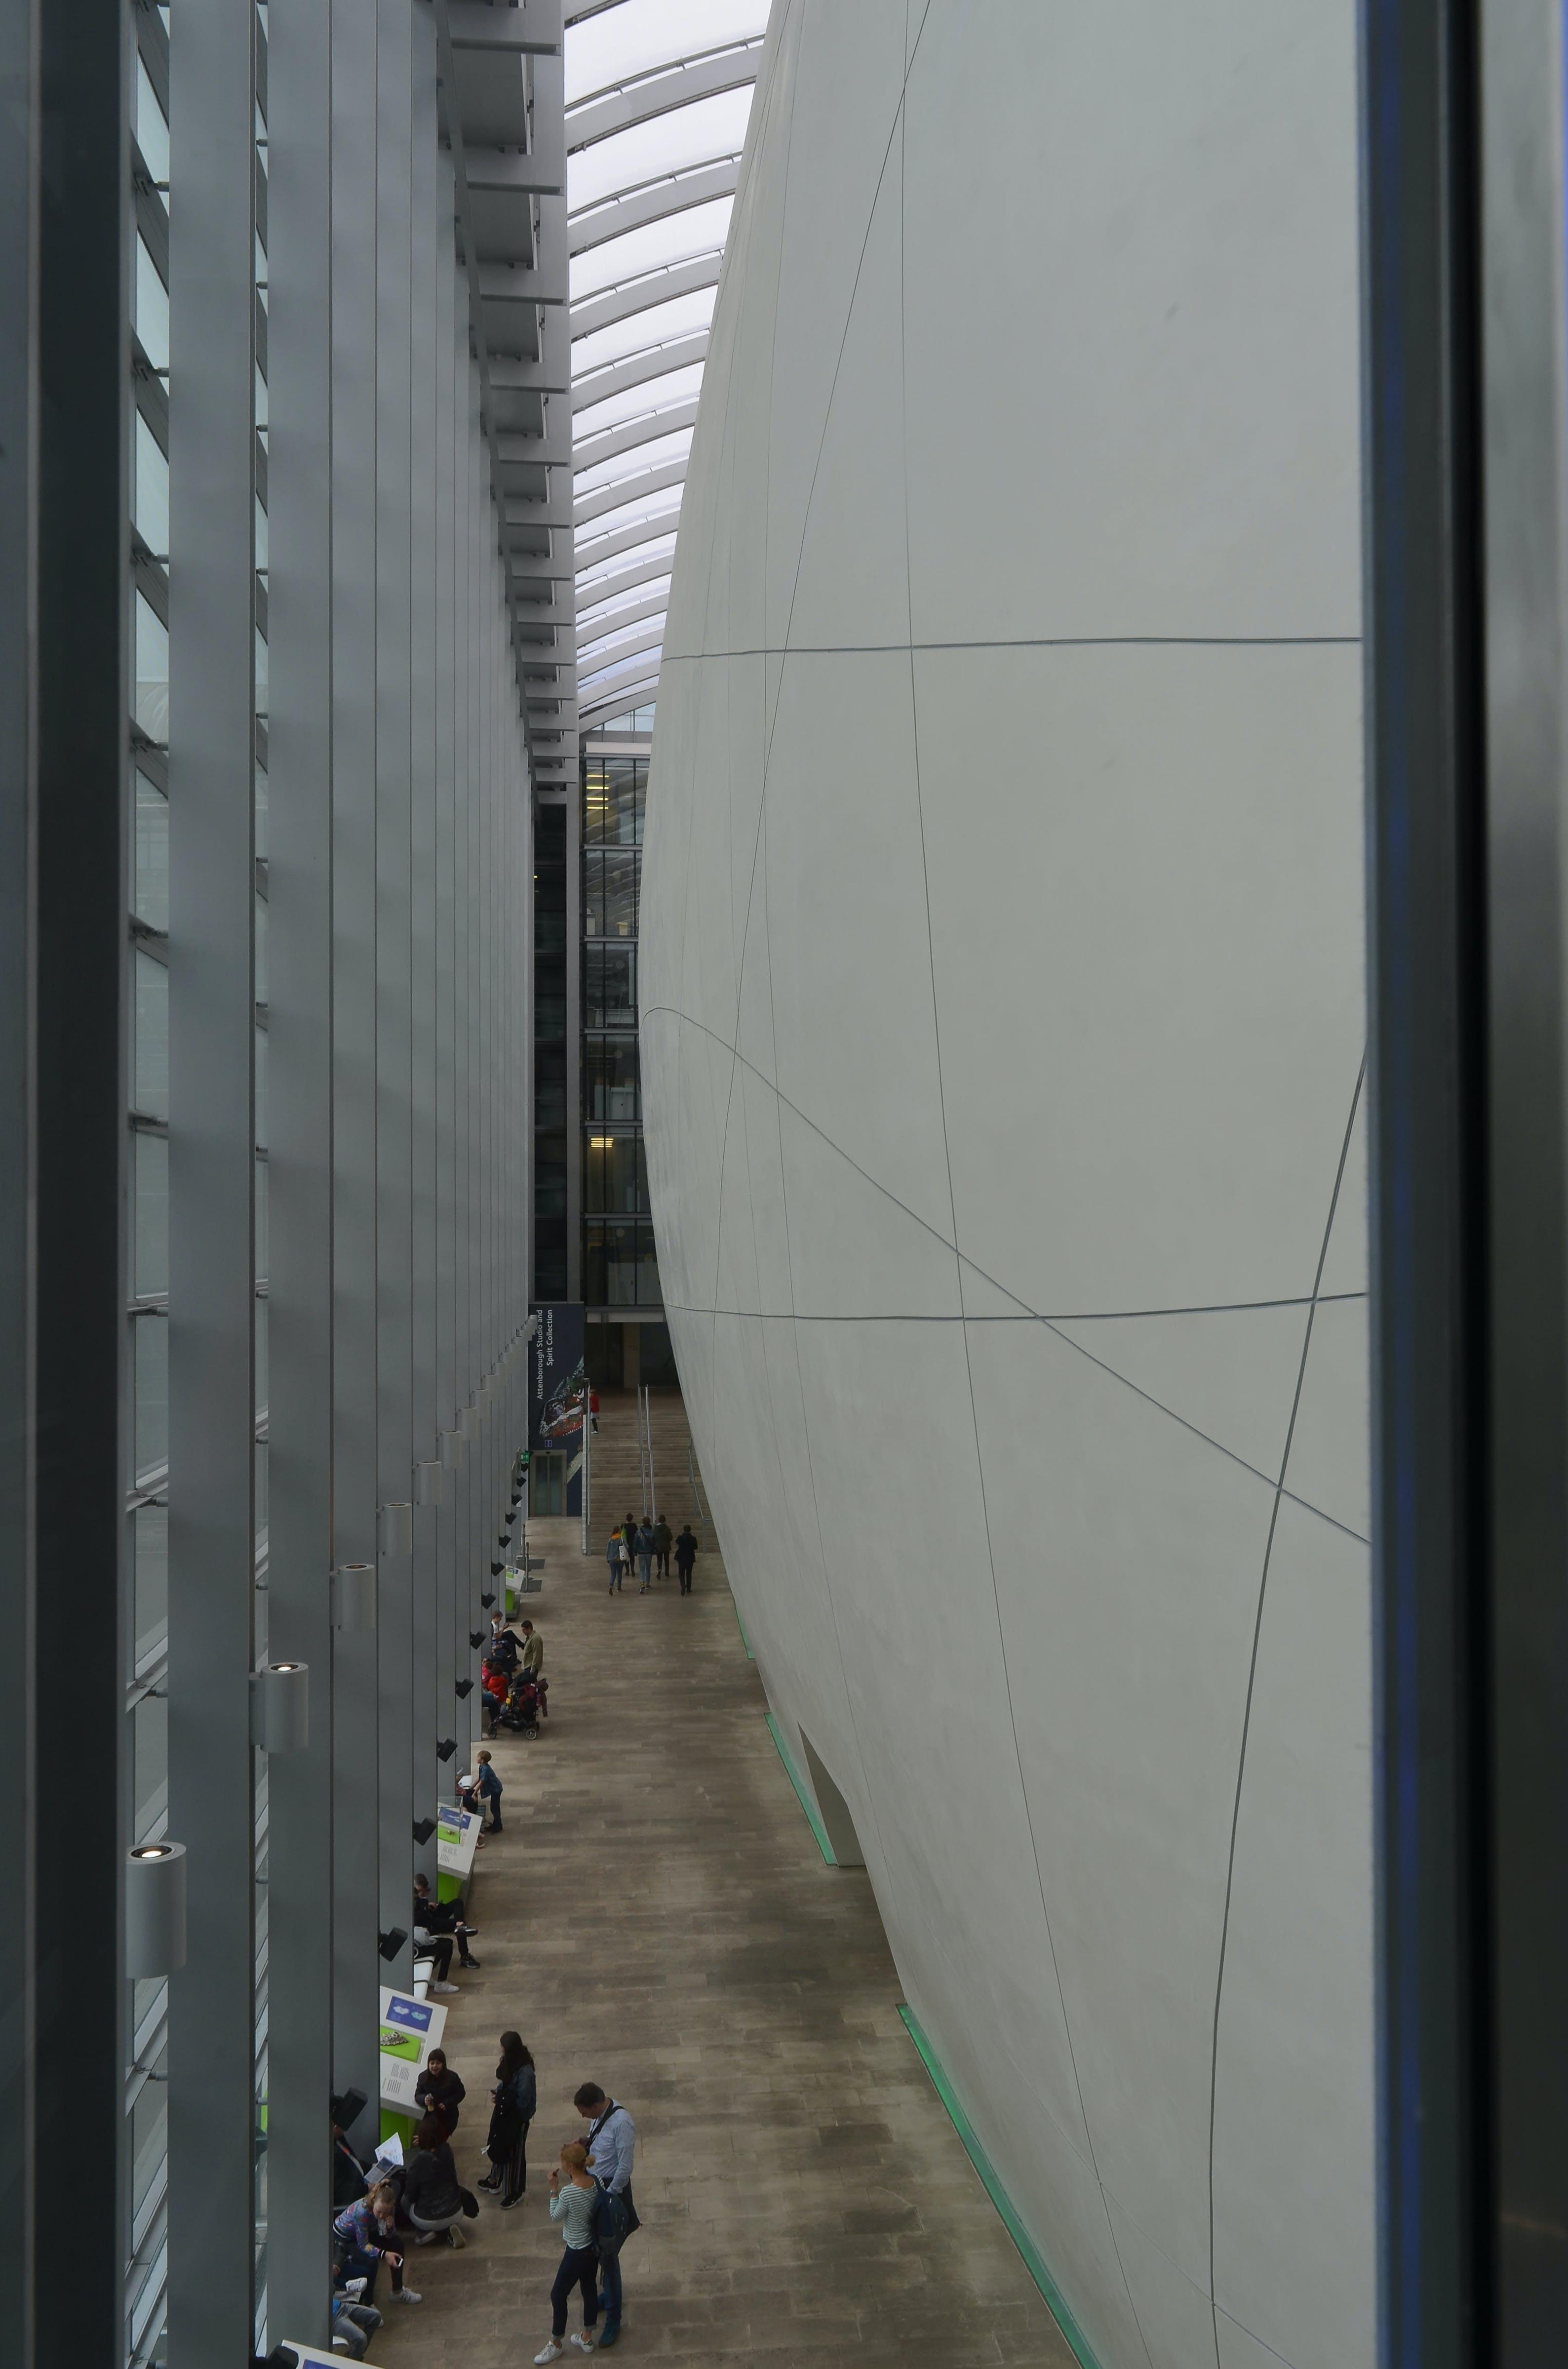 Gratis arkivbilde med abstrakte linjer, arkitektur, bølgende veggen, fugleperspektiv